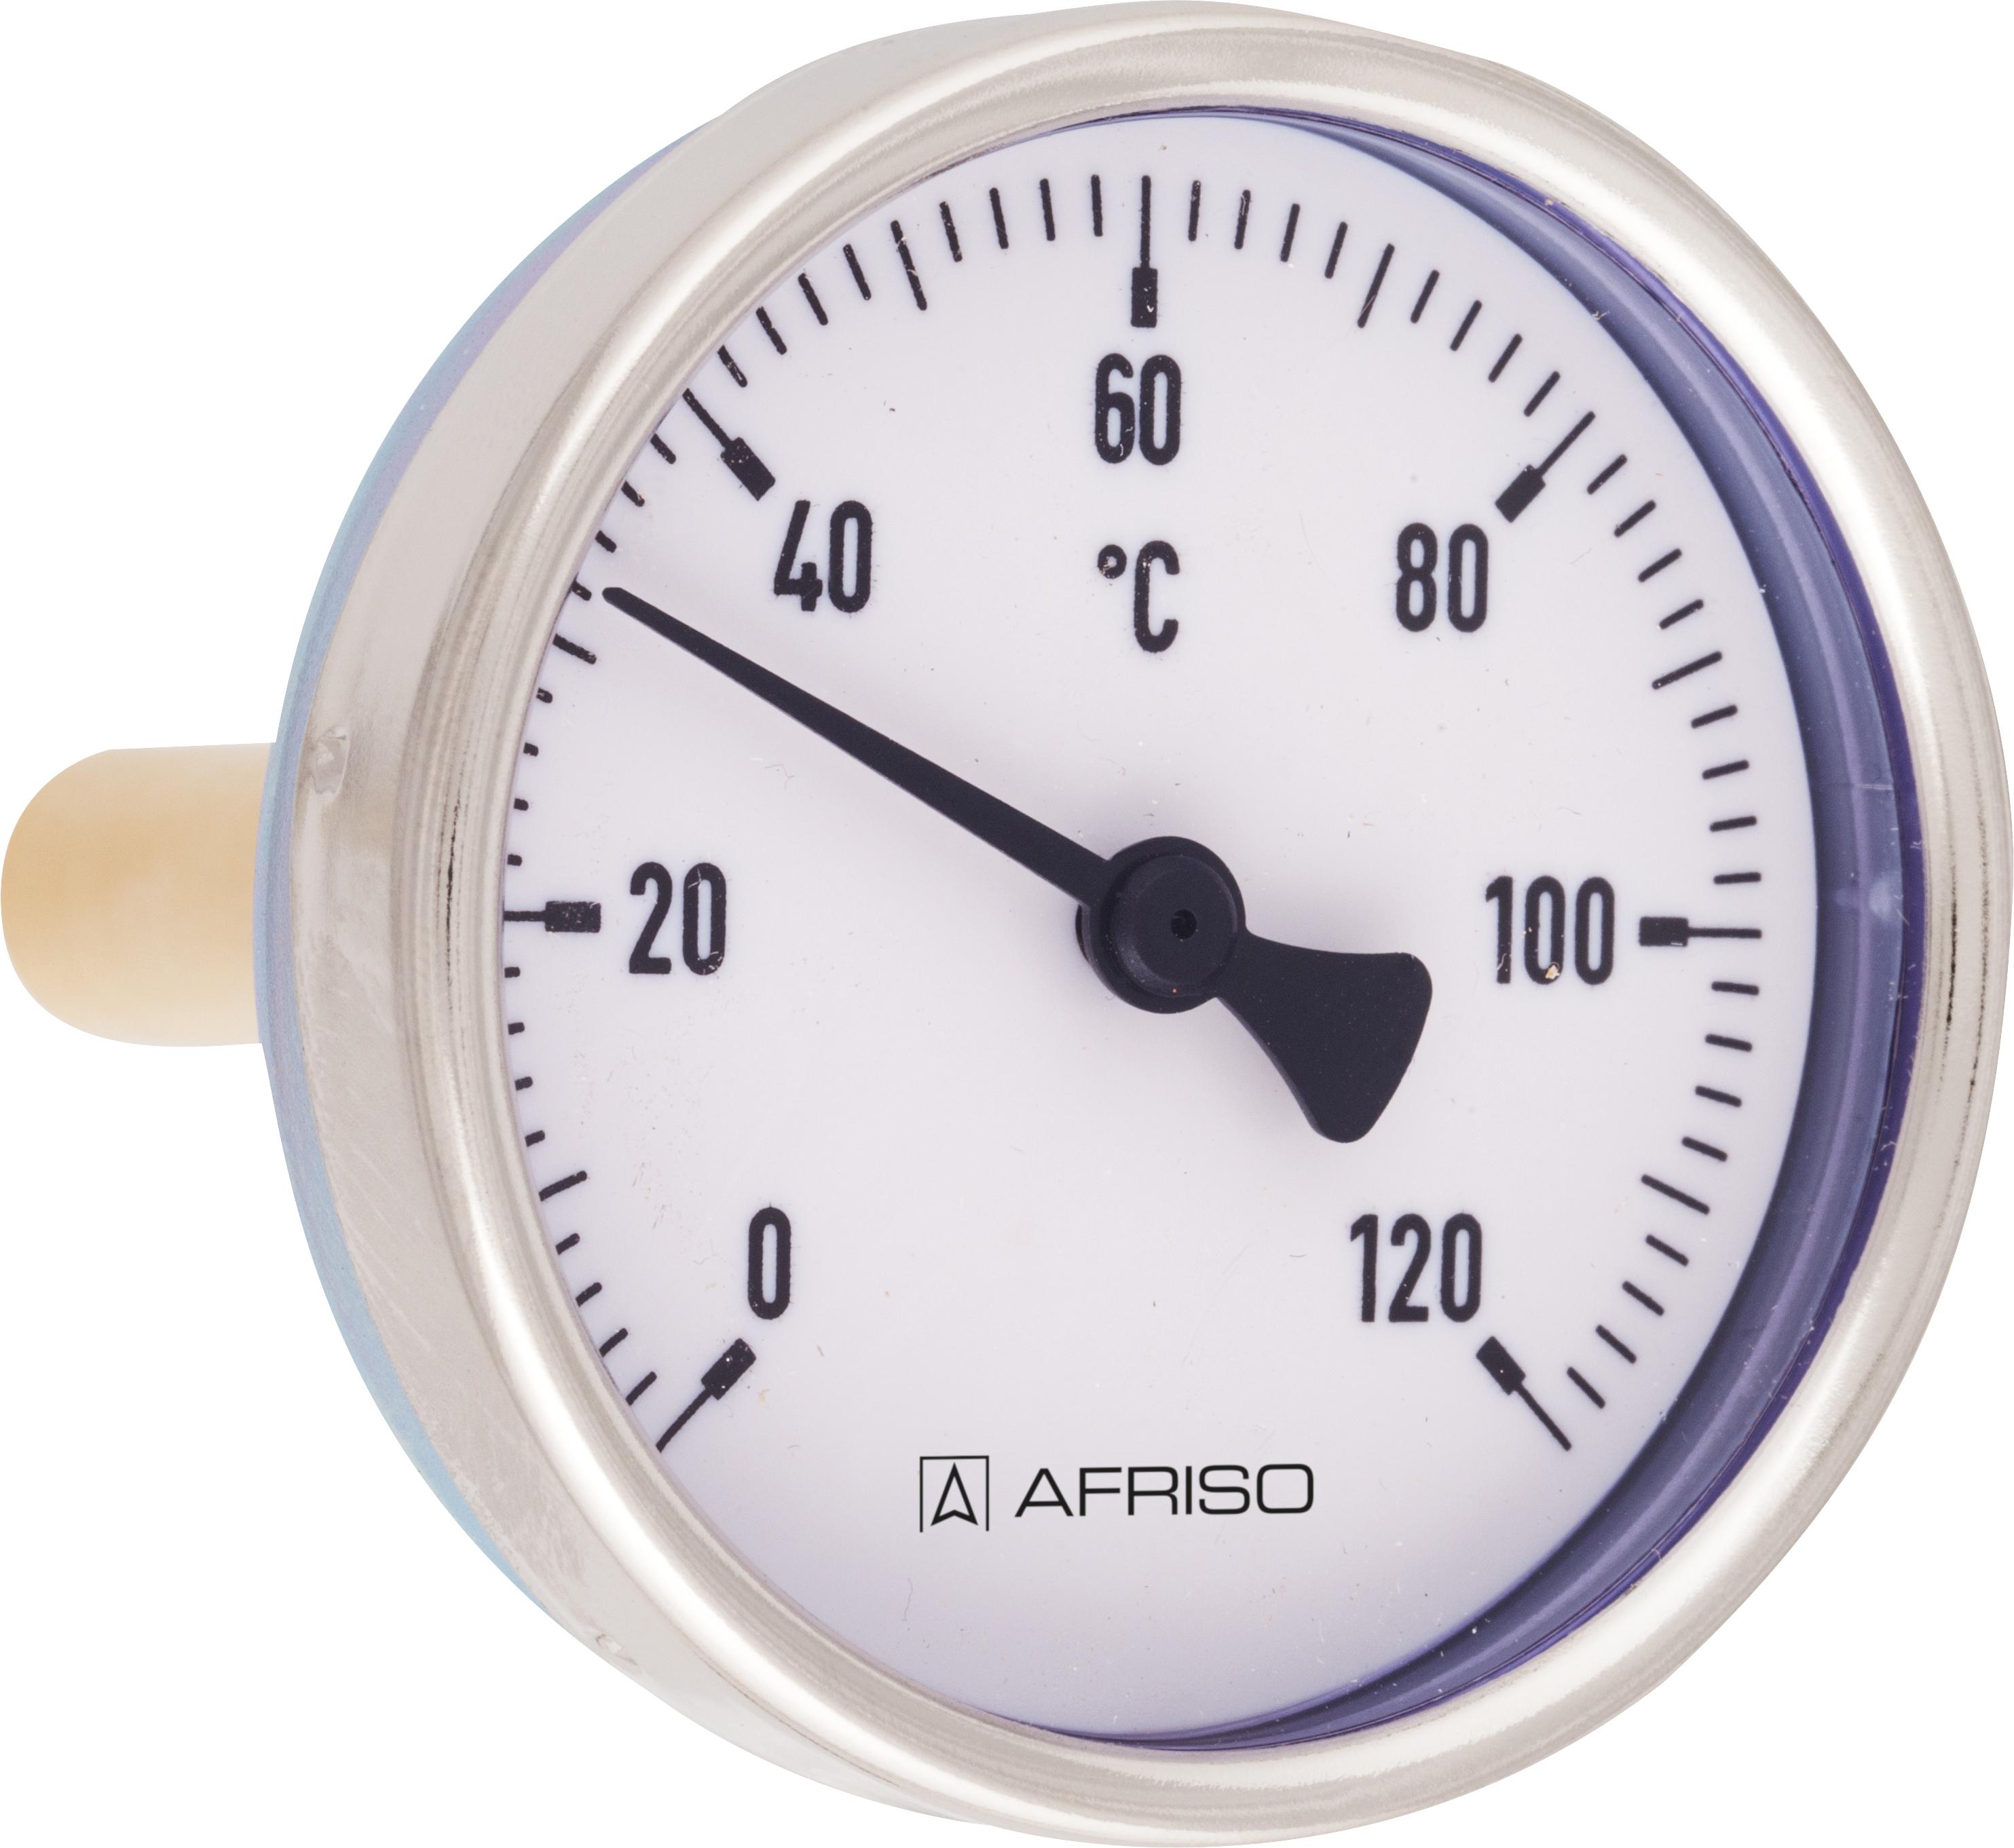 Termometr bimetaliczny BiTh 100 E, D302, fi100 mm, 0÷60°C, L 100 mm, rad, kl. 1